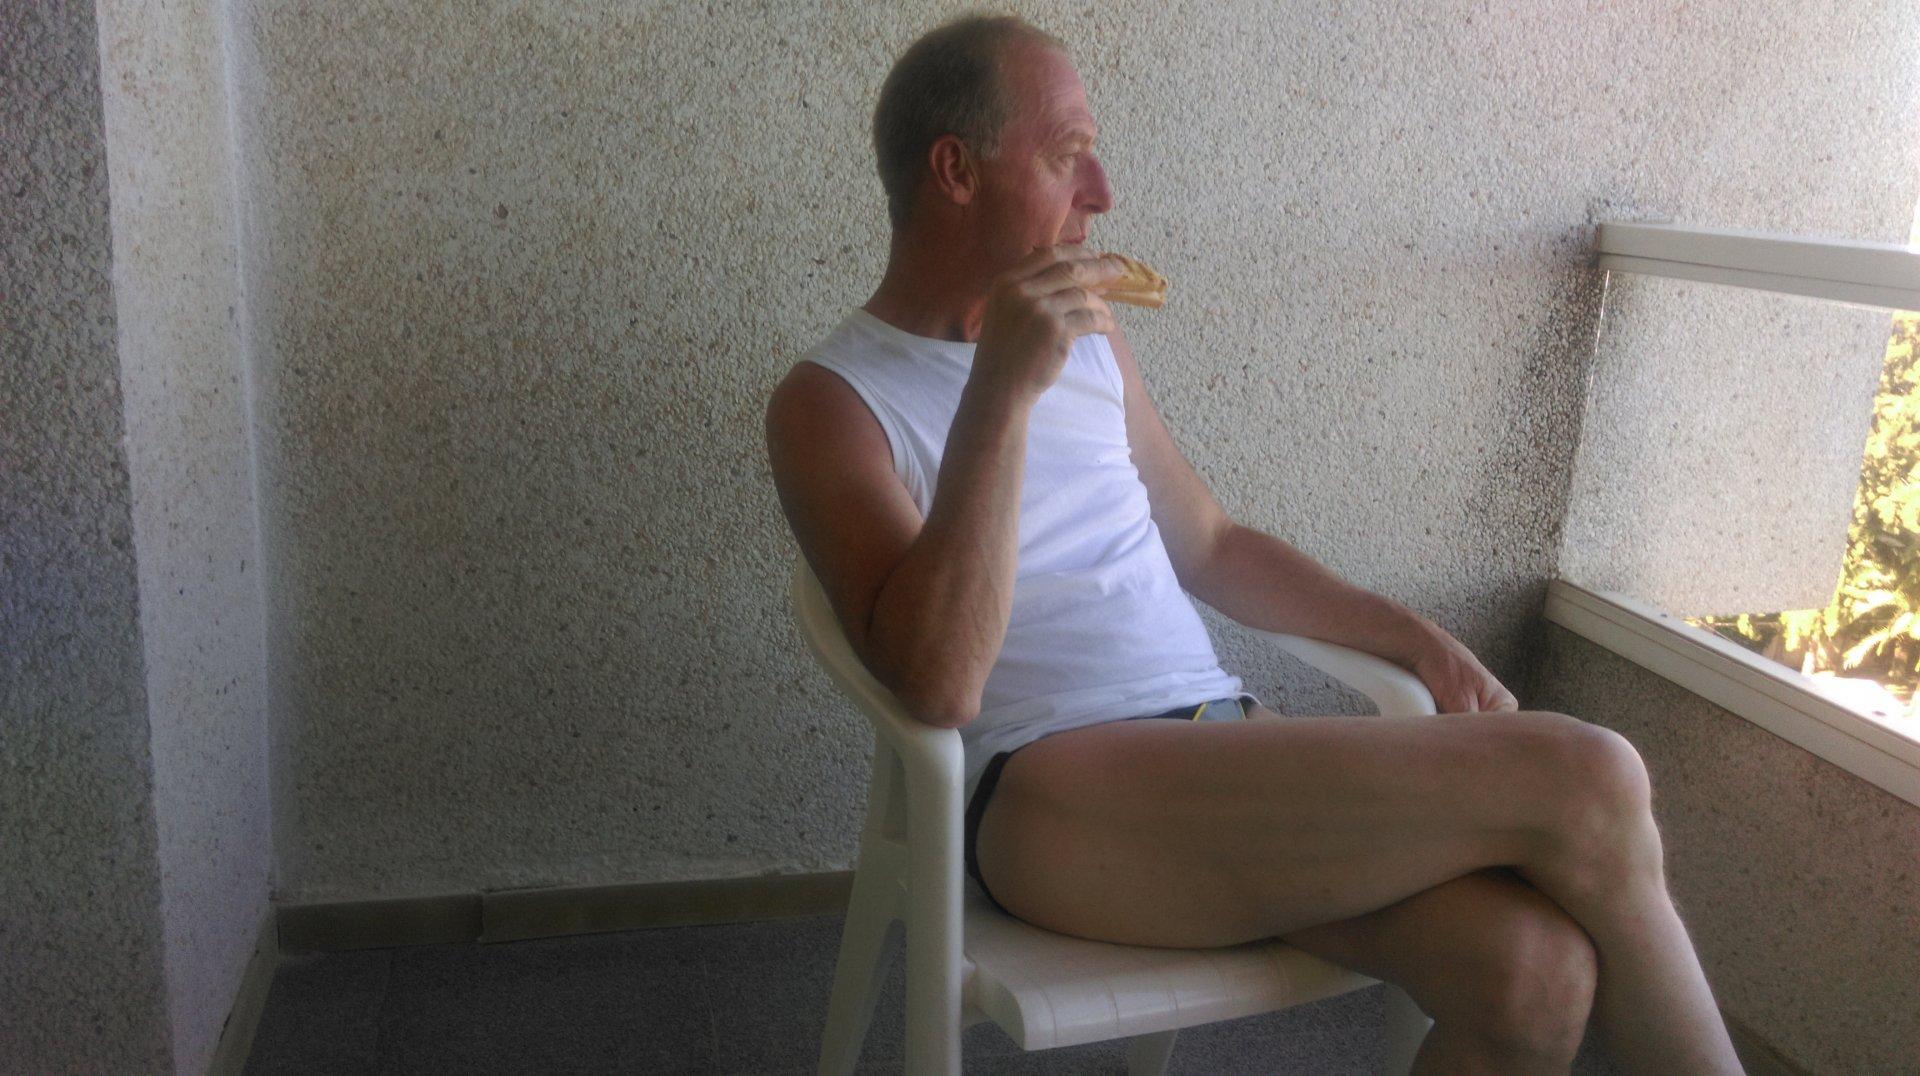 hans is hot uit Drenthe,Nederland